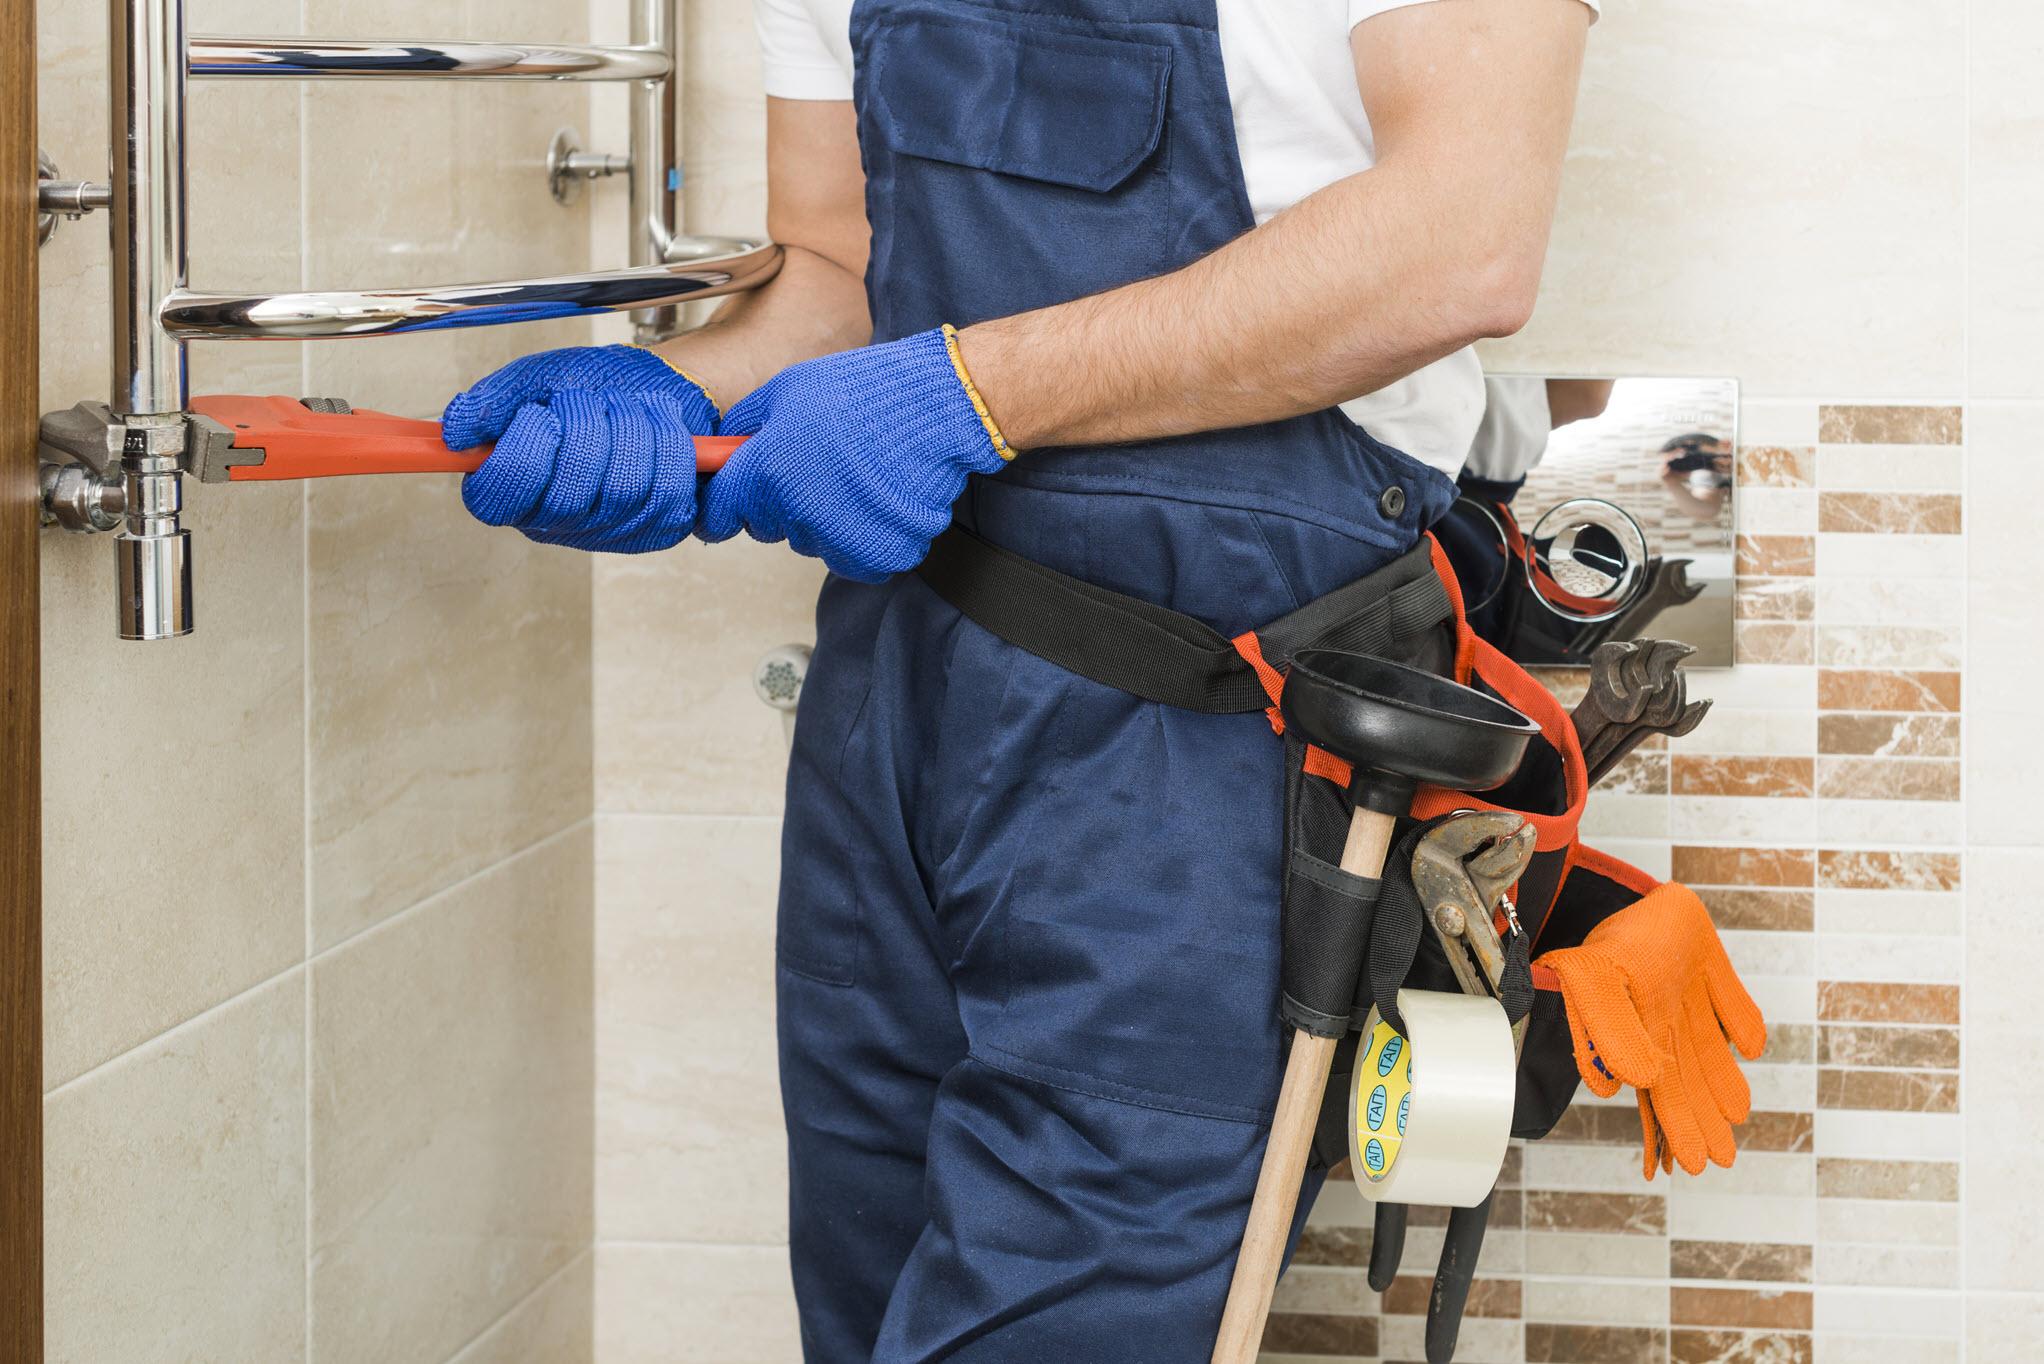 9 tips for choosing a good plumber | Lifehack